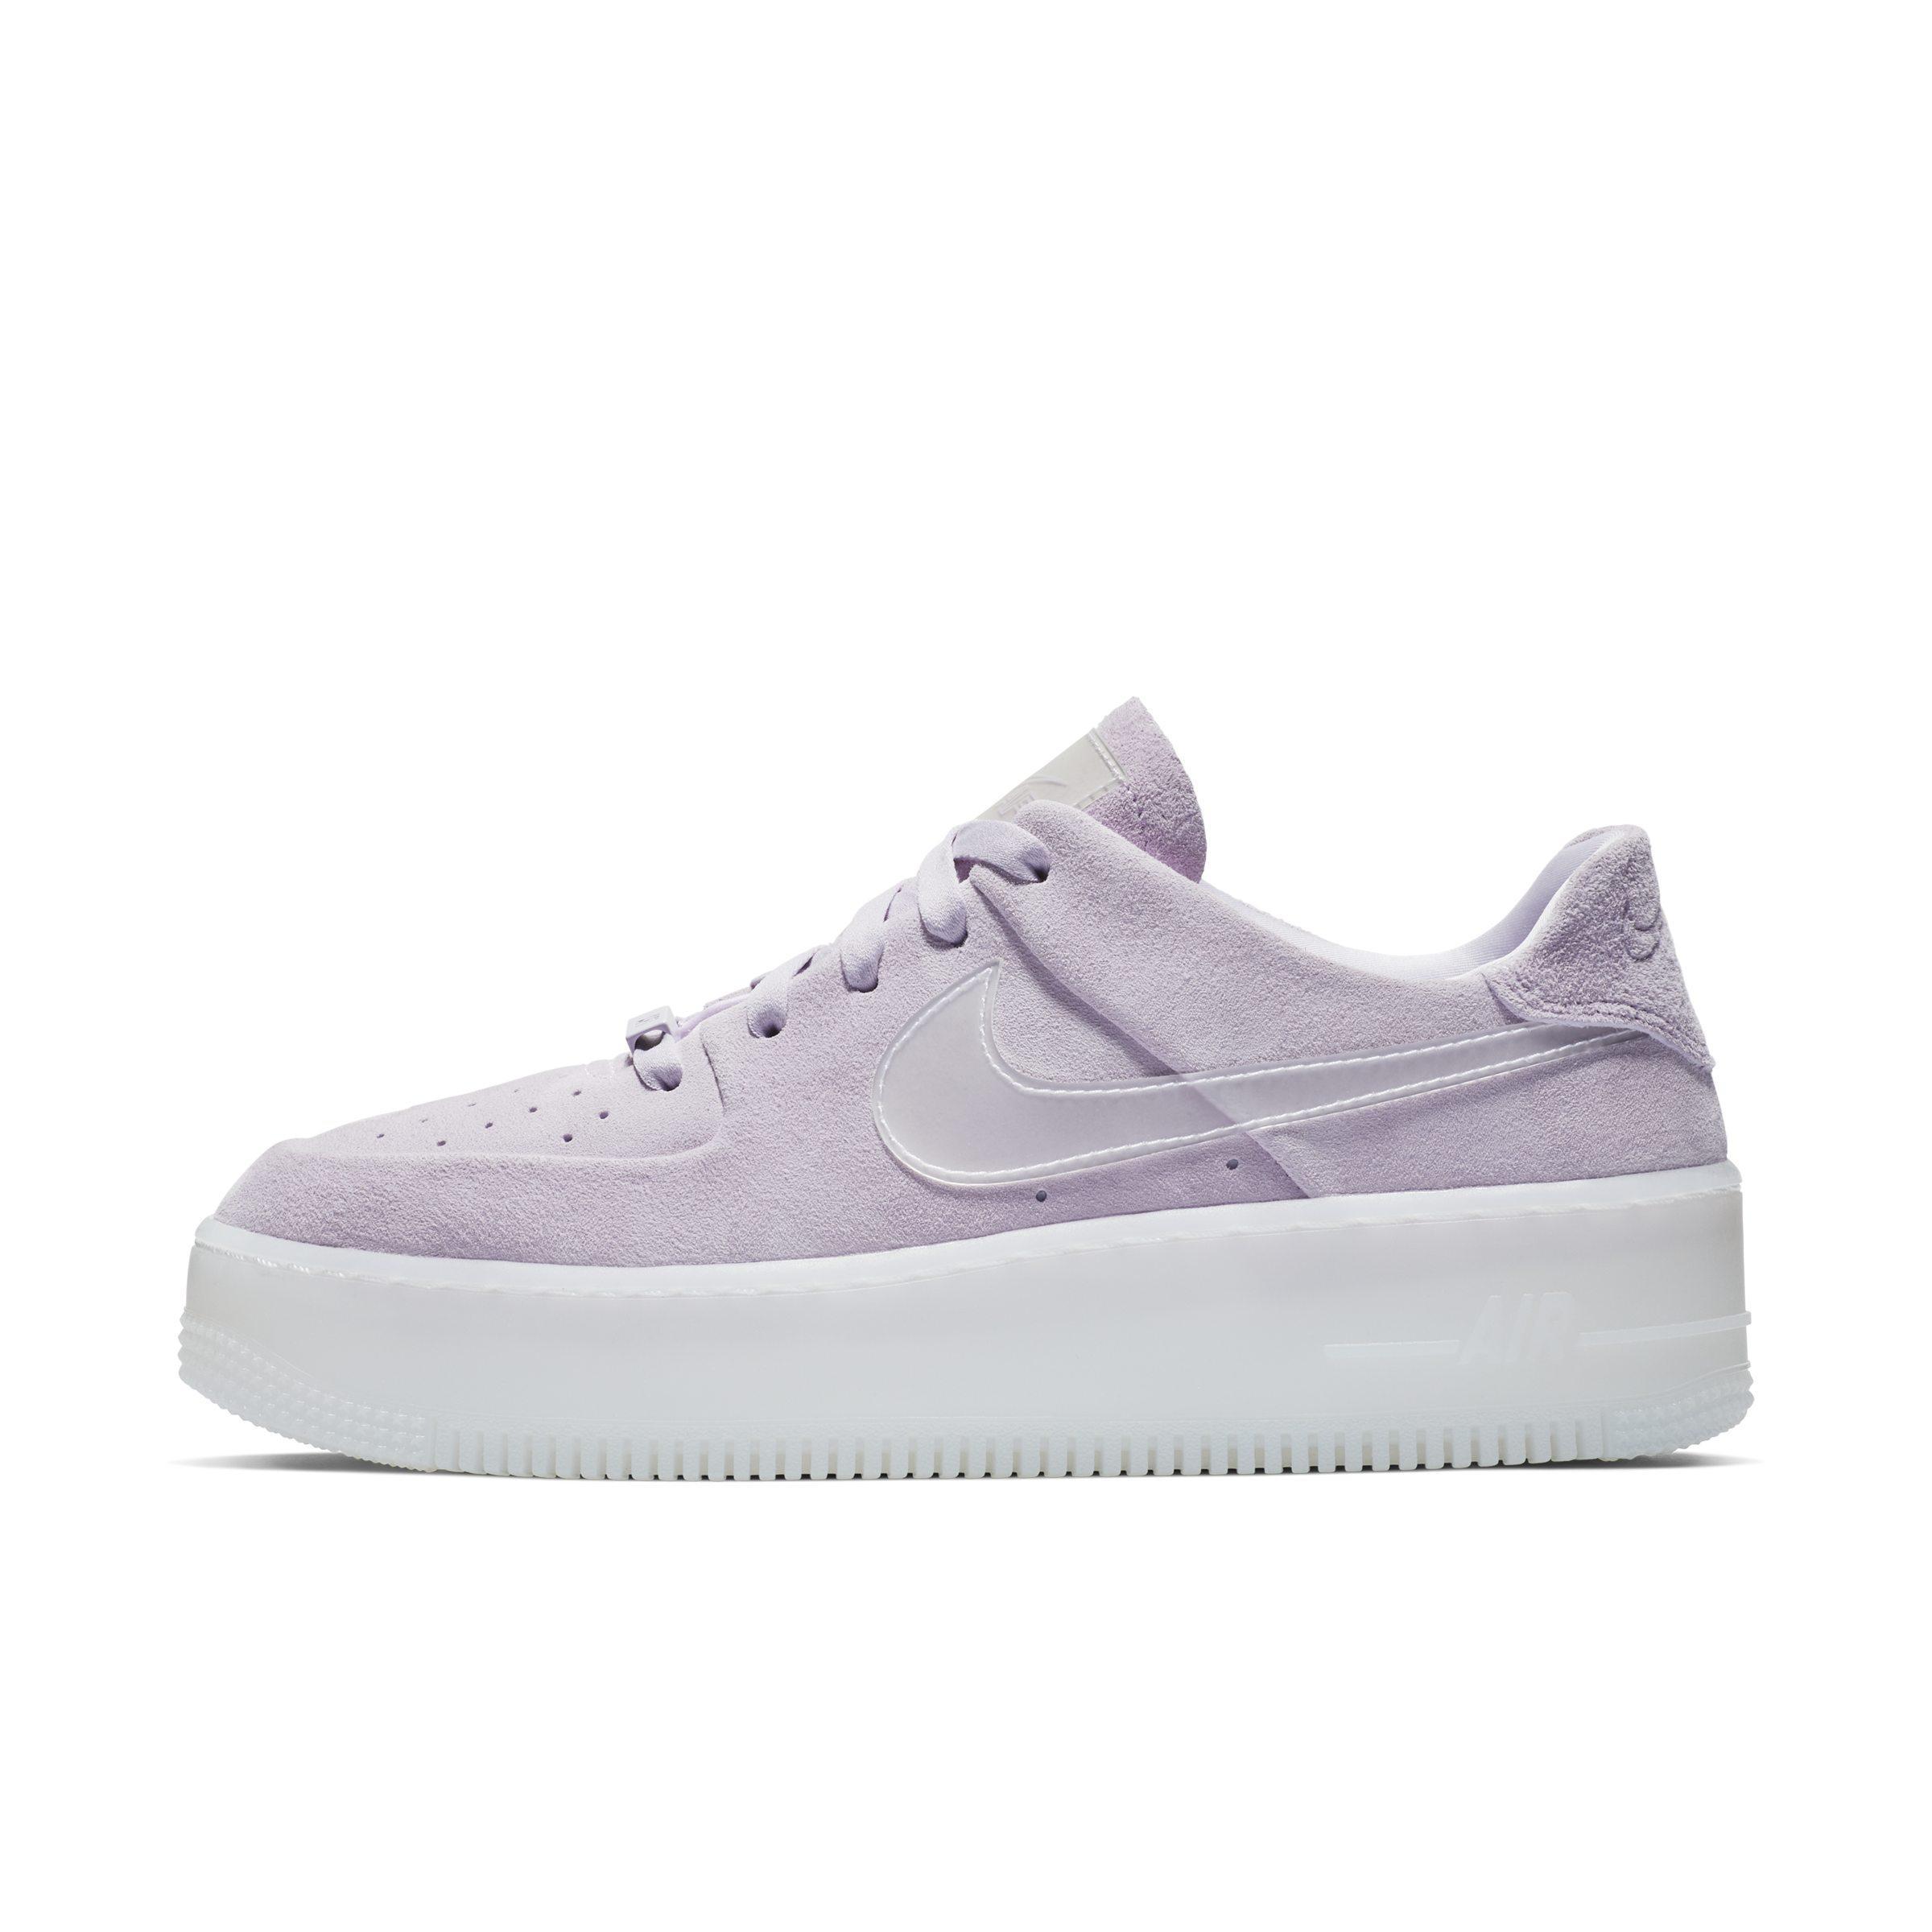 nike air force 1 donna lilla